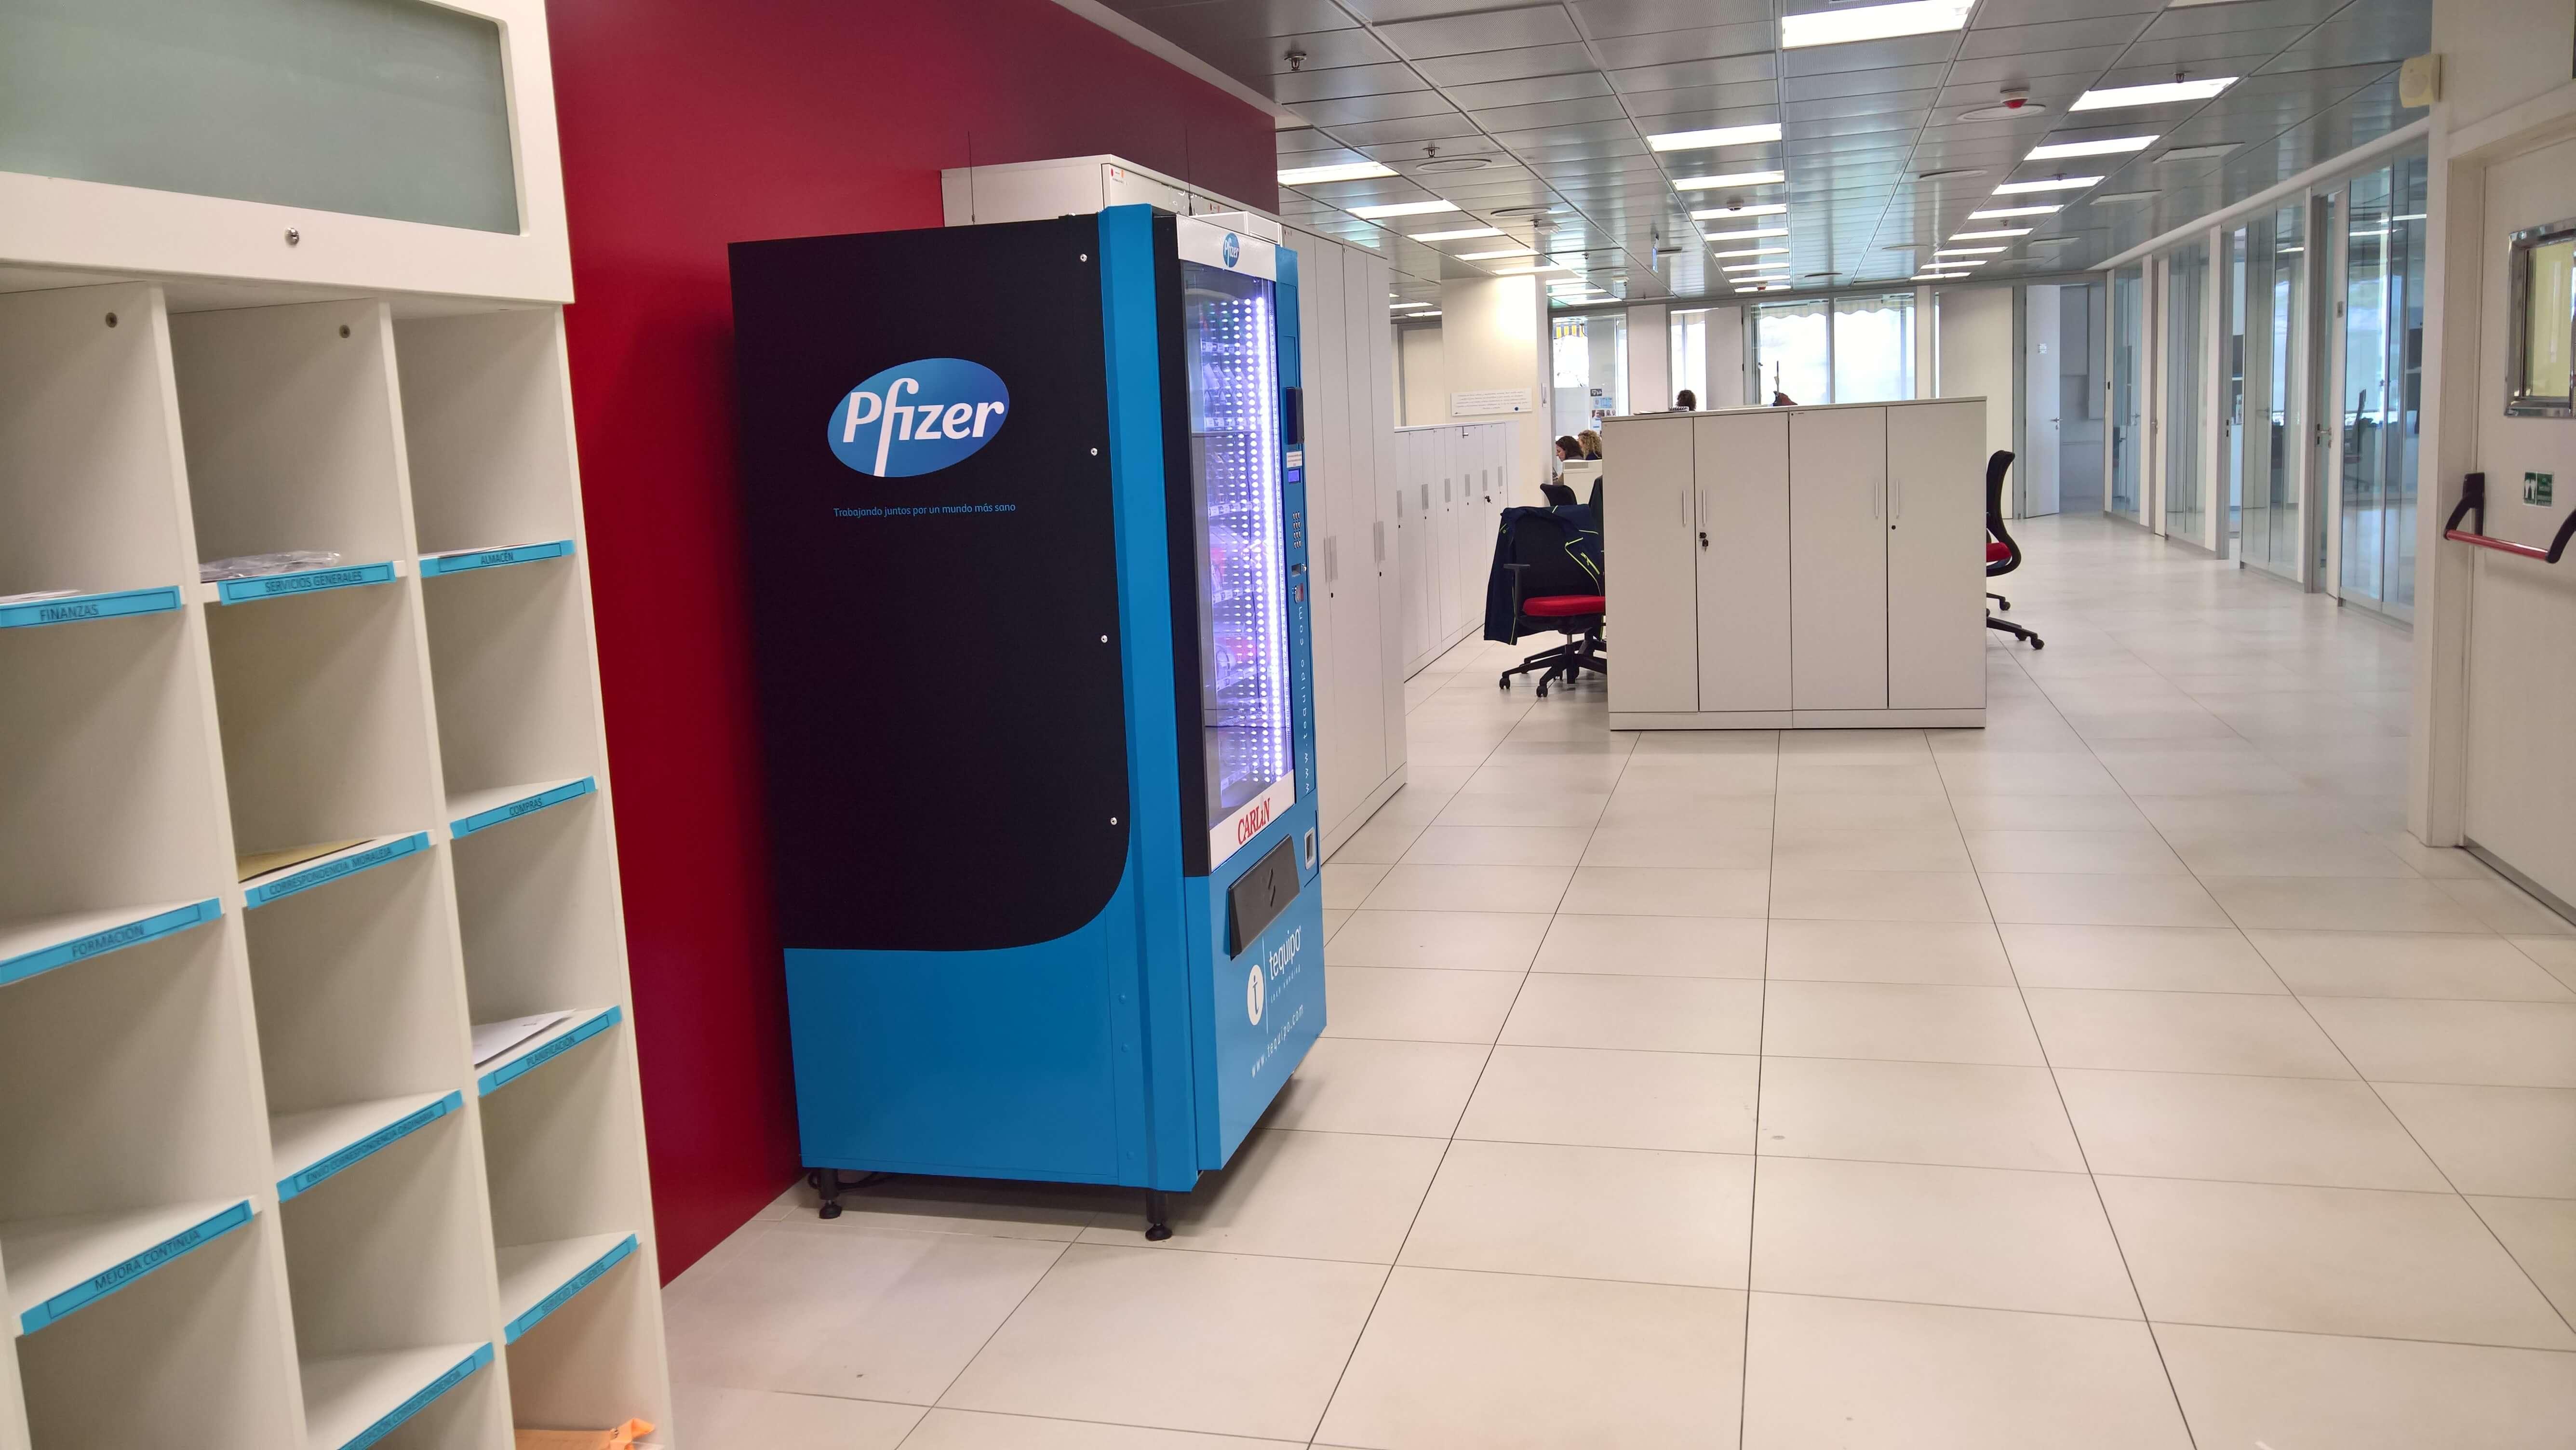 Máquina expendedora Pfizer